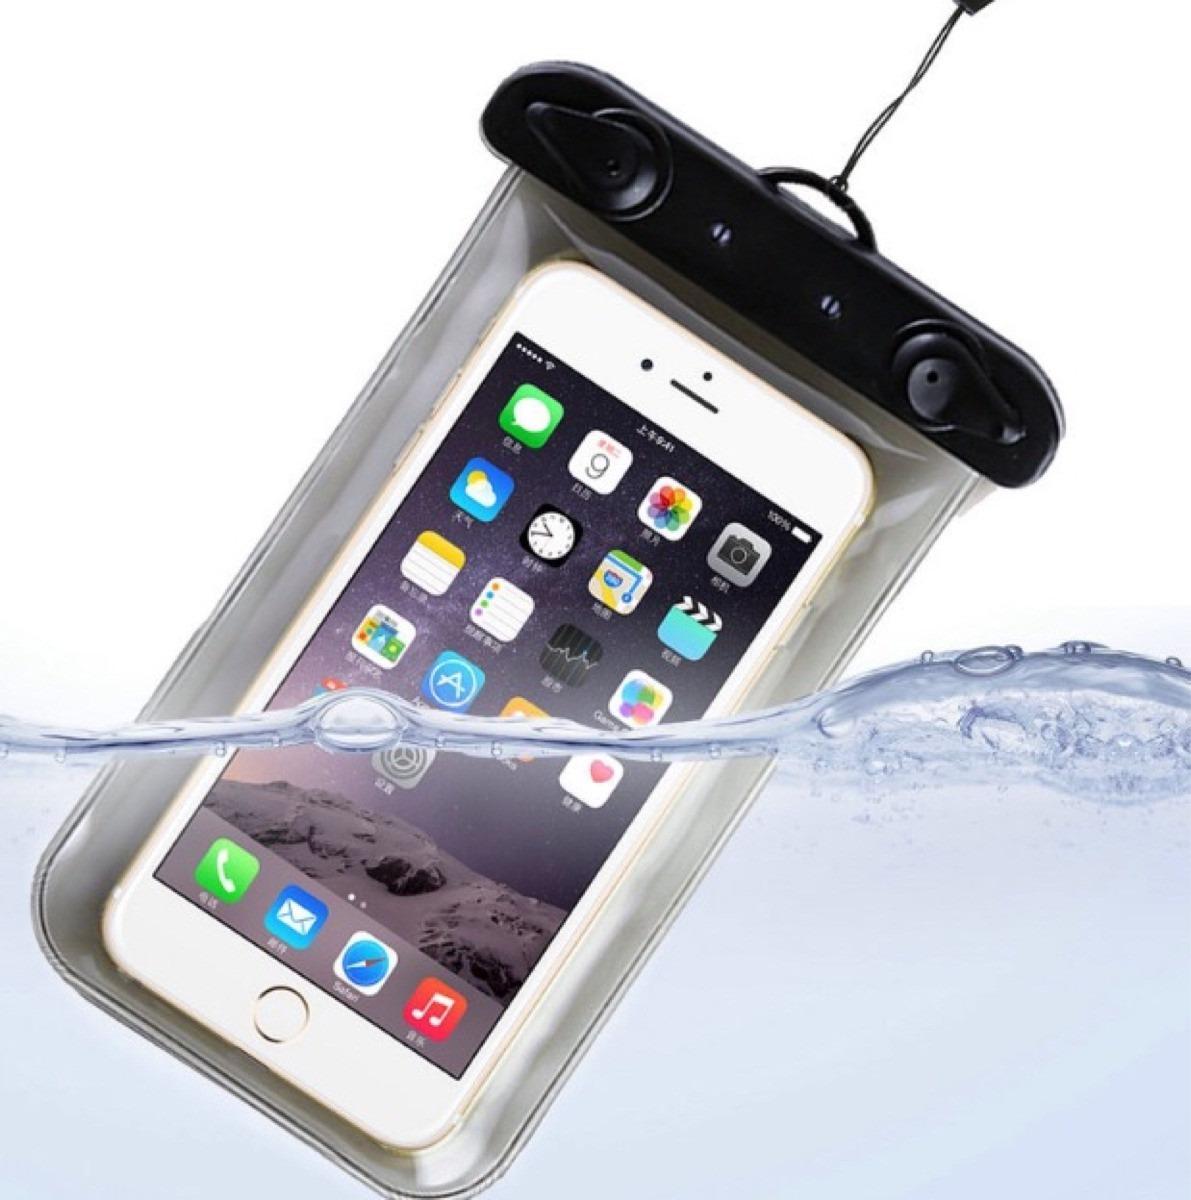 8010784b91b funda acuatica p/ celulares iphone samsung lg note 5 apple 6. Cargando zoom.